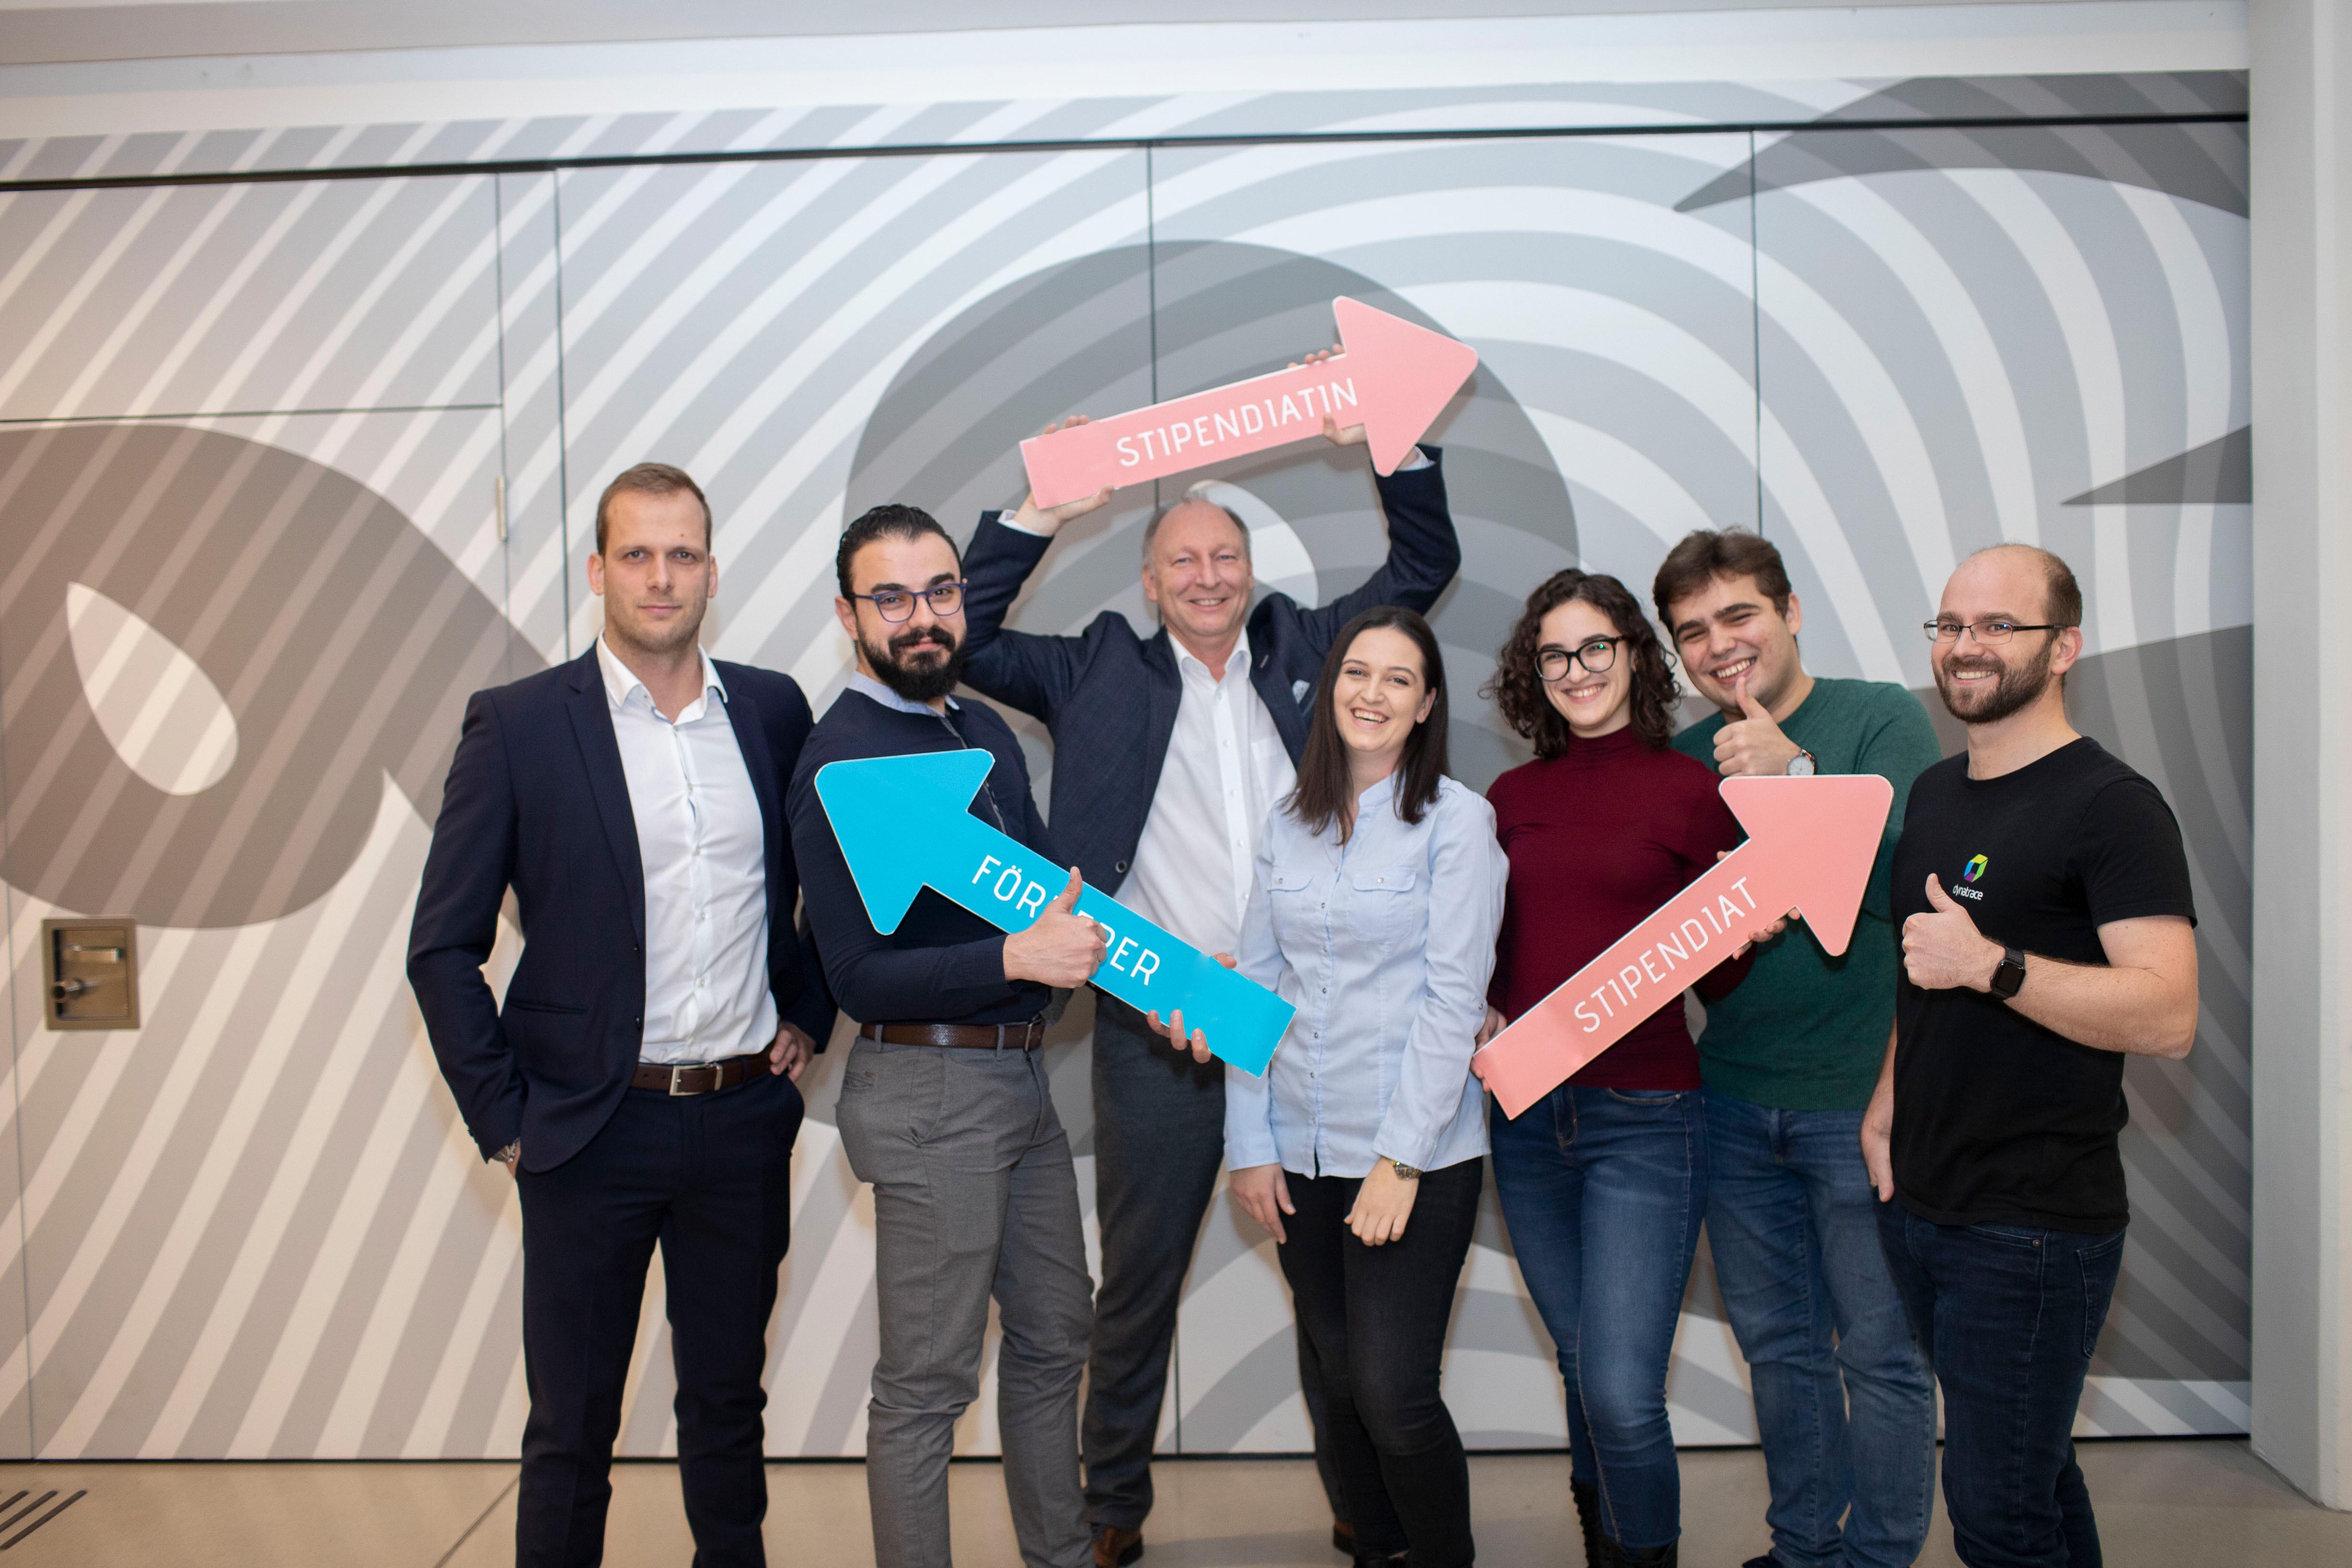 Technology Scholarship lockt internationale IT-Studierende